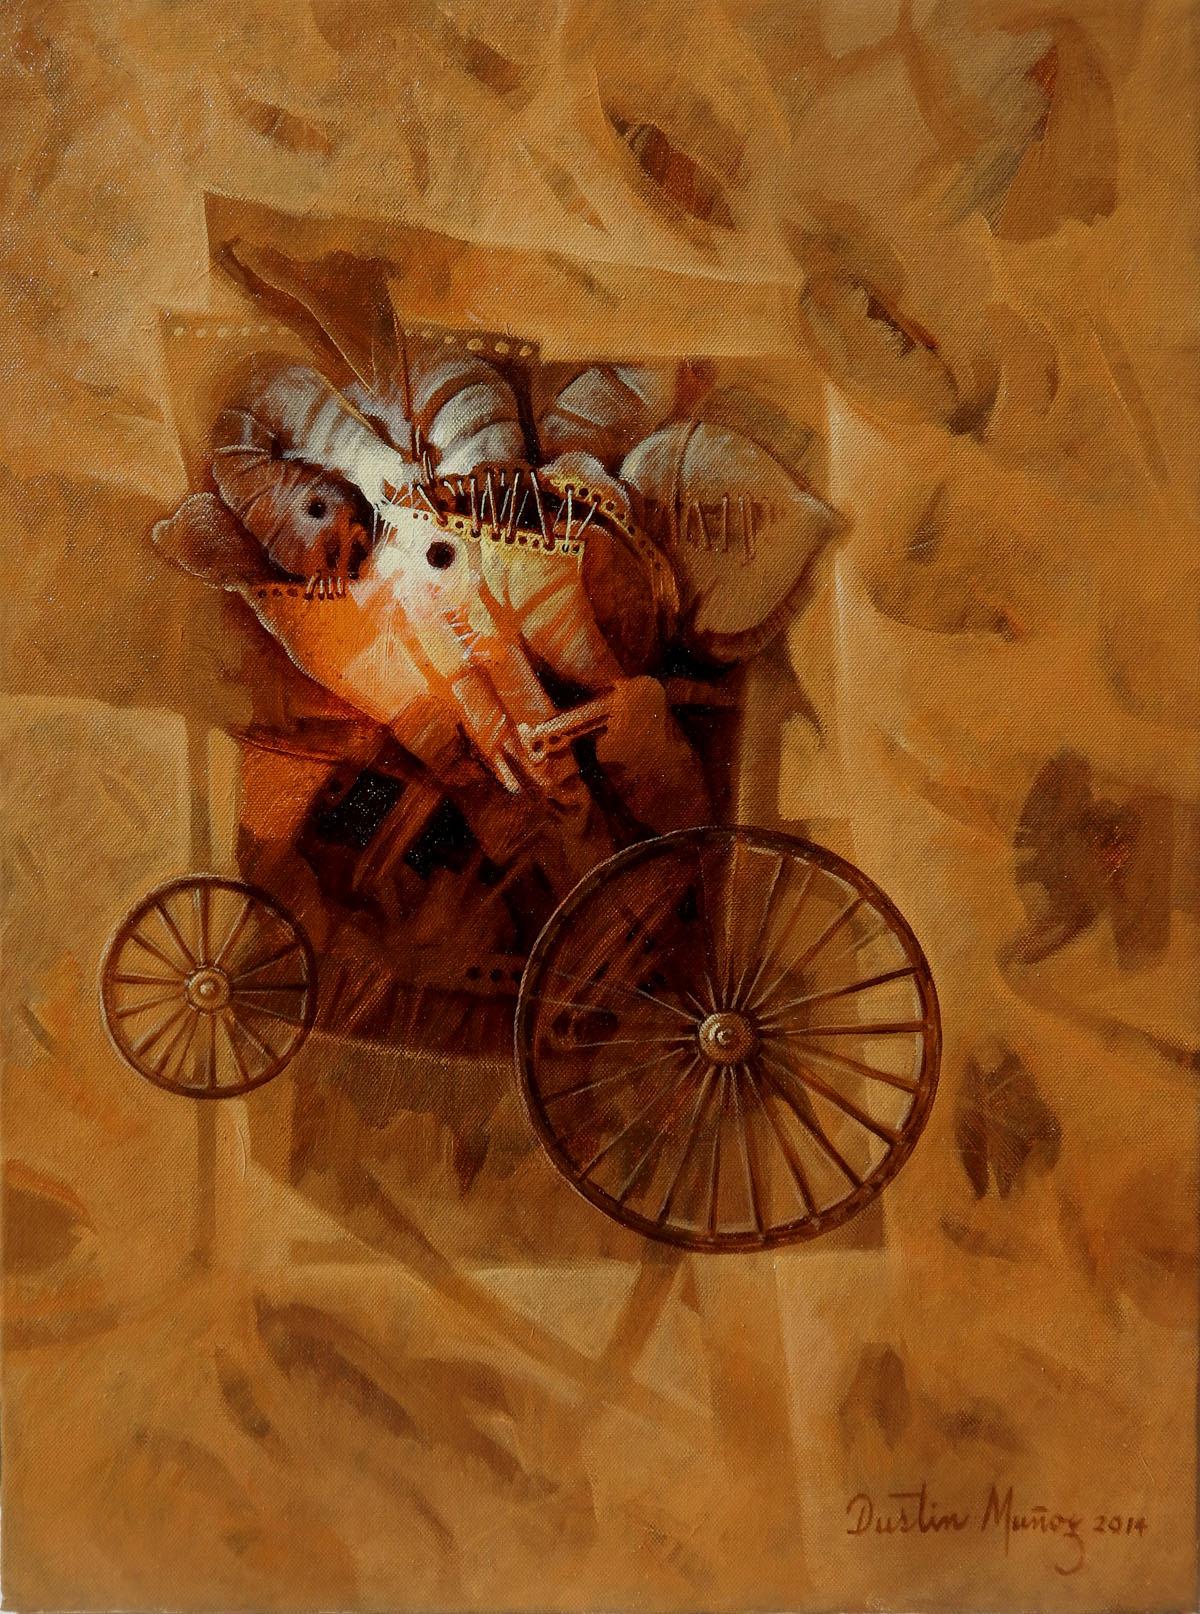 Baúl de recuerdos, 24x18 pulgs, Dustin Muñoz, 2014